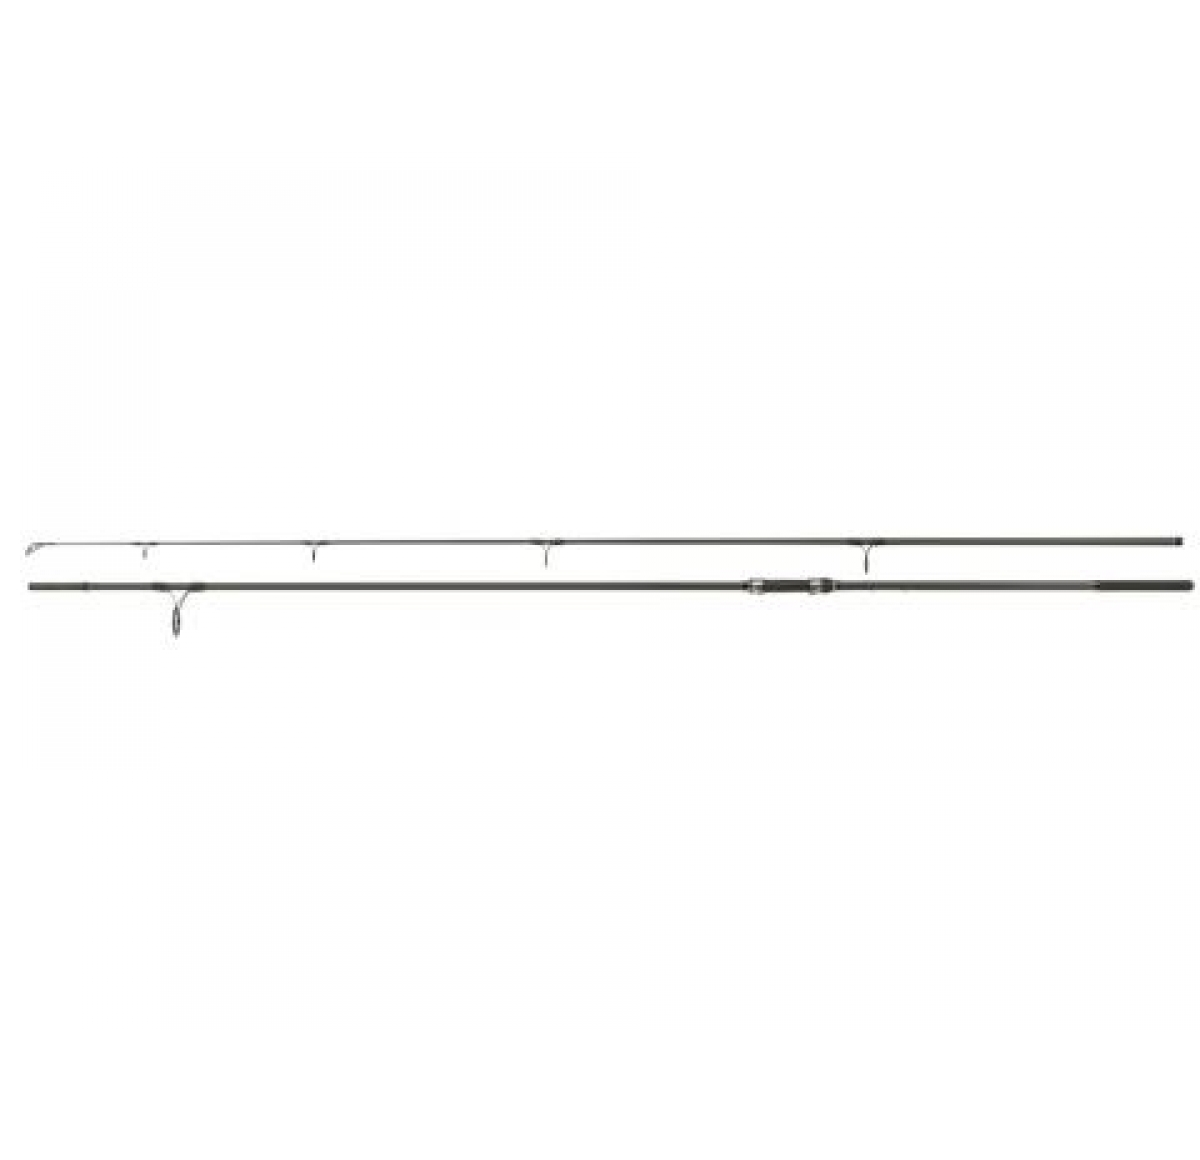 Pelzer Bondage LR 366 cm 3.00 lbs